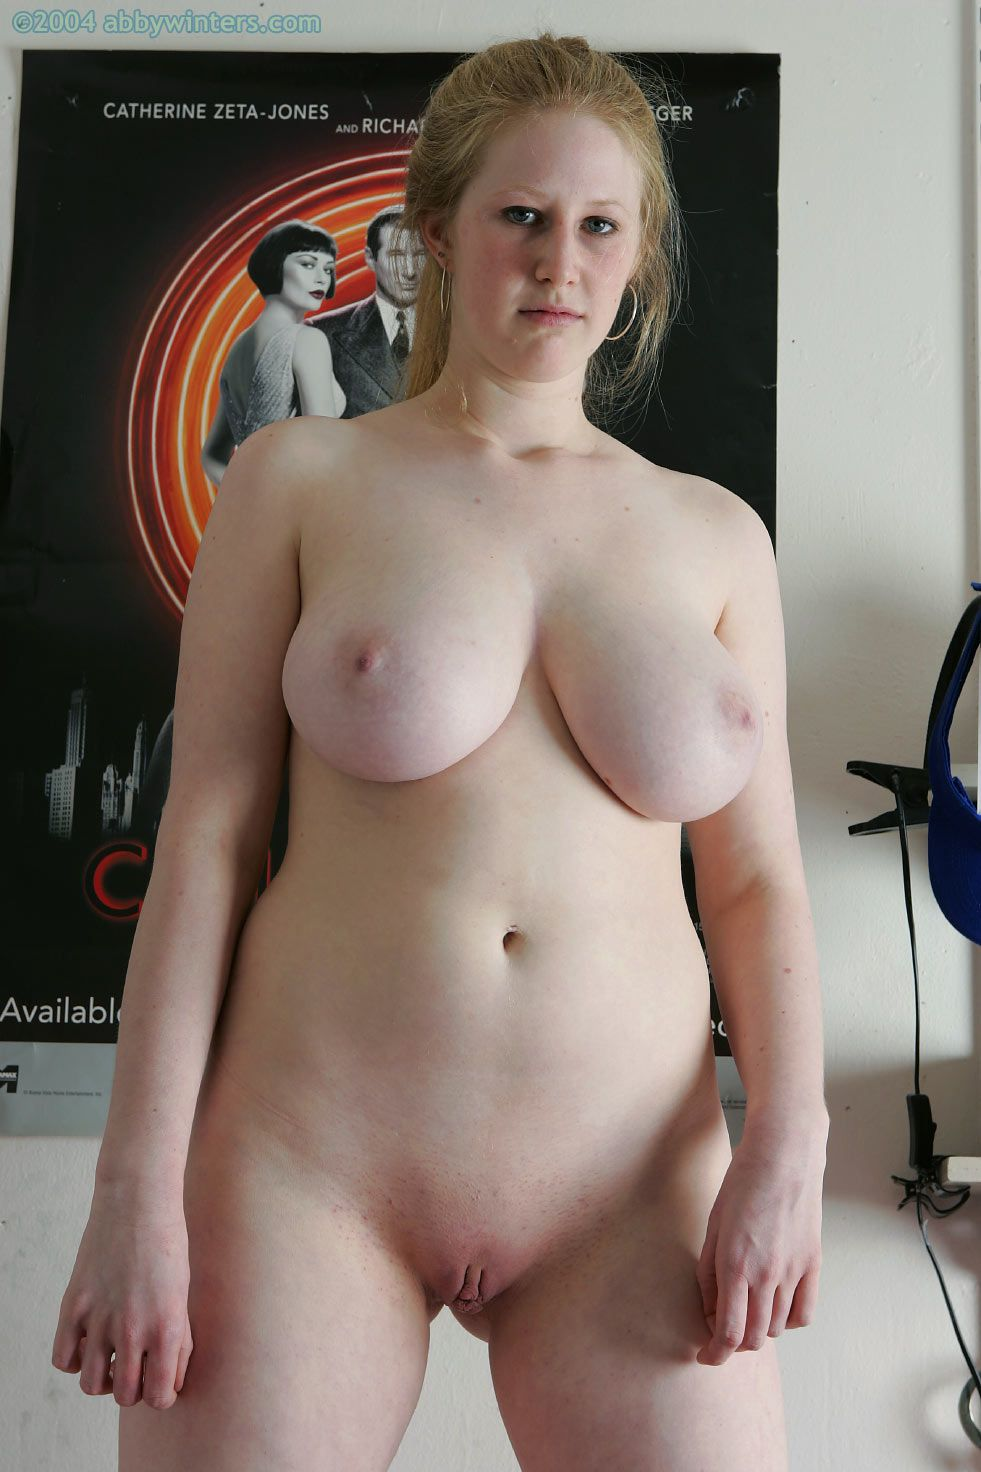 chubby girl naked